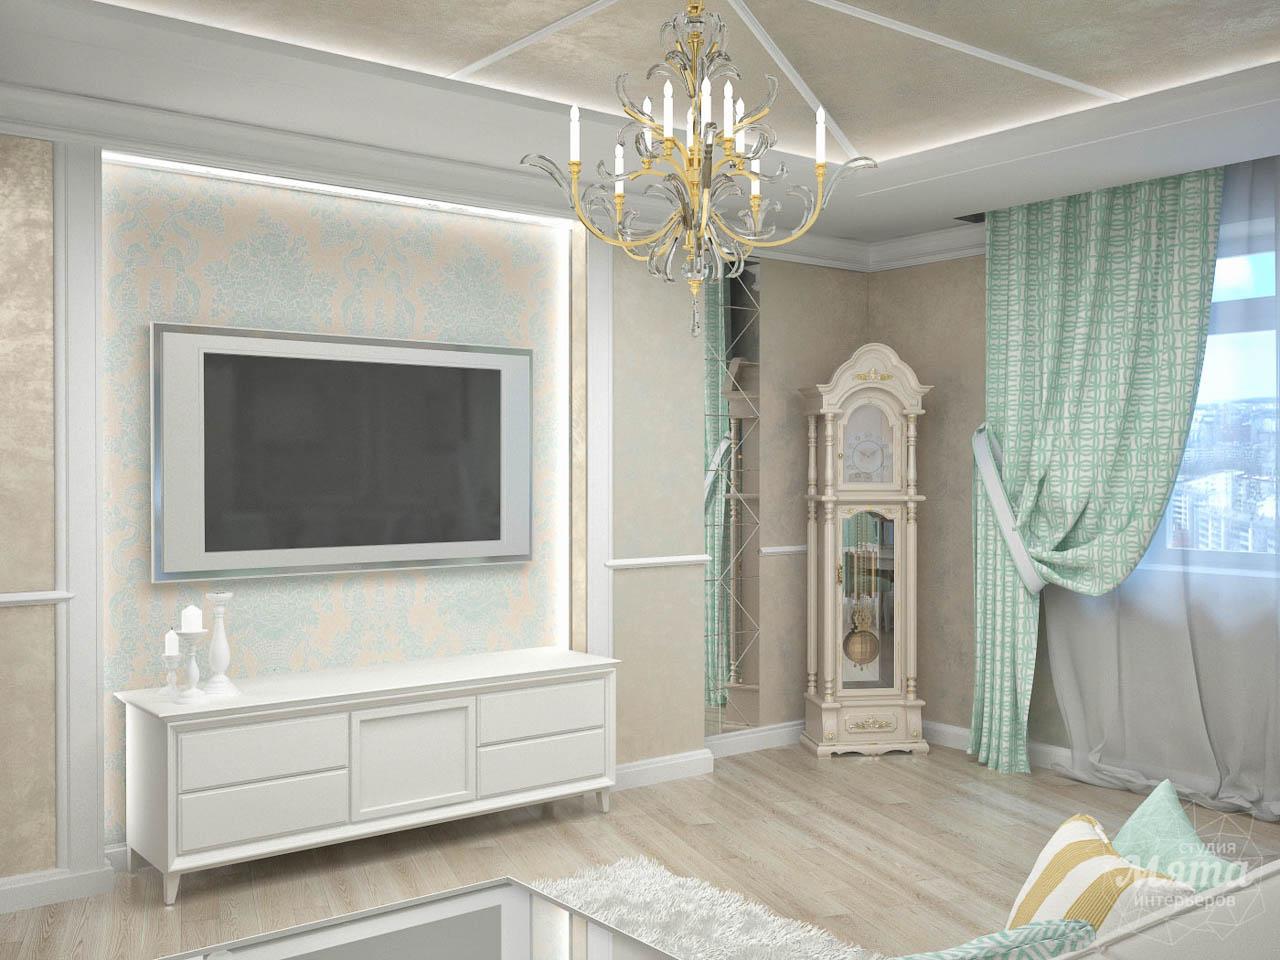 Дизайн интерьера и ремонт трехкомнатной квартиры по ул. 8 Марта 190 img1834626083